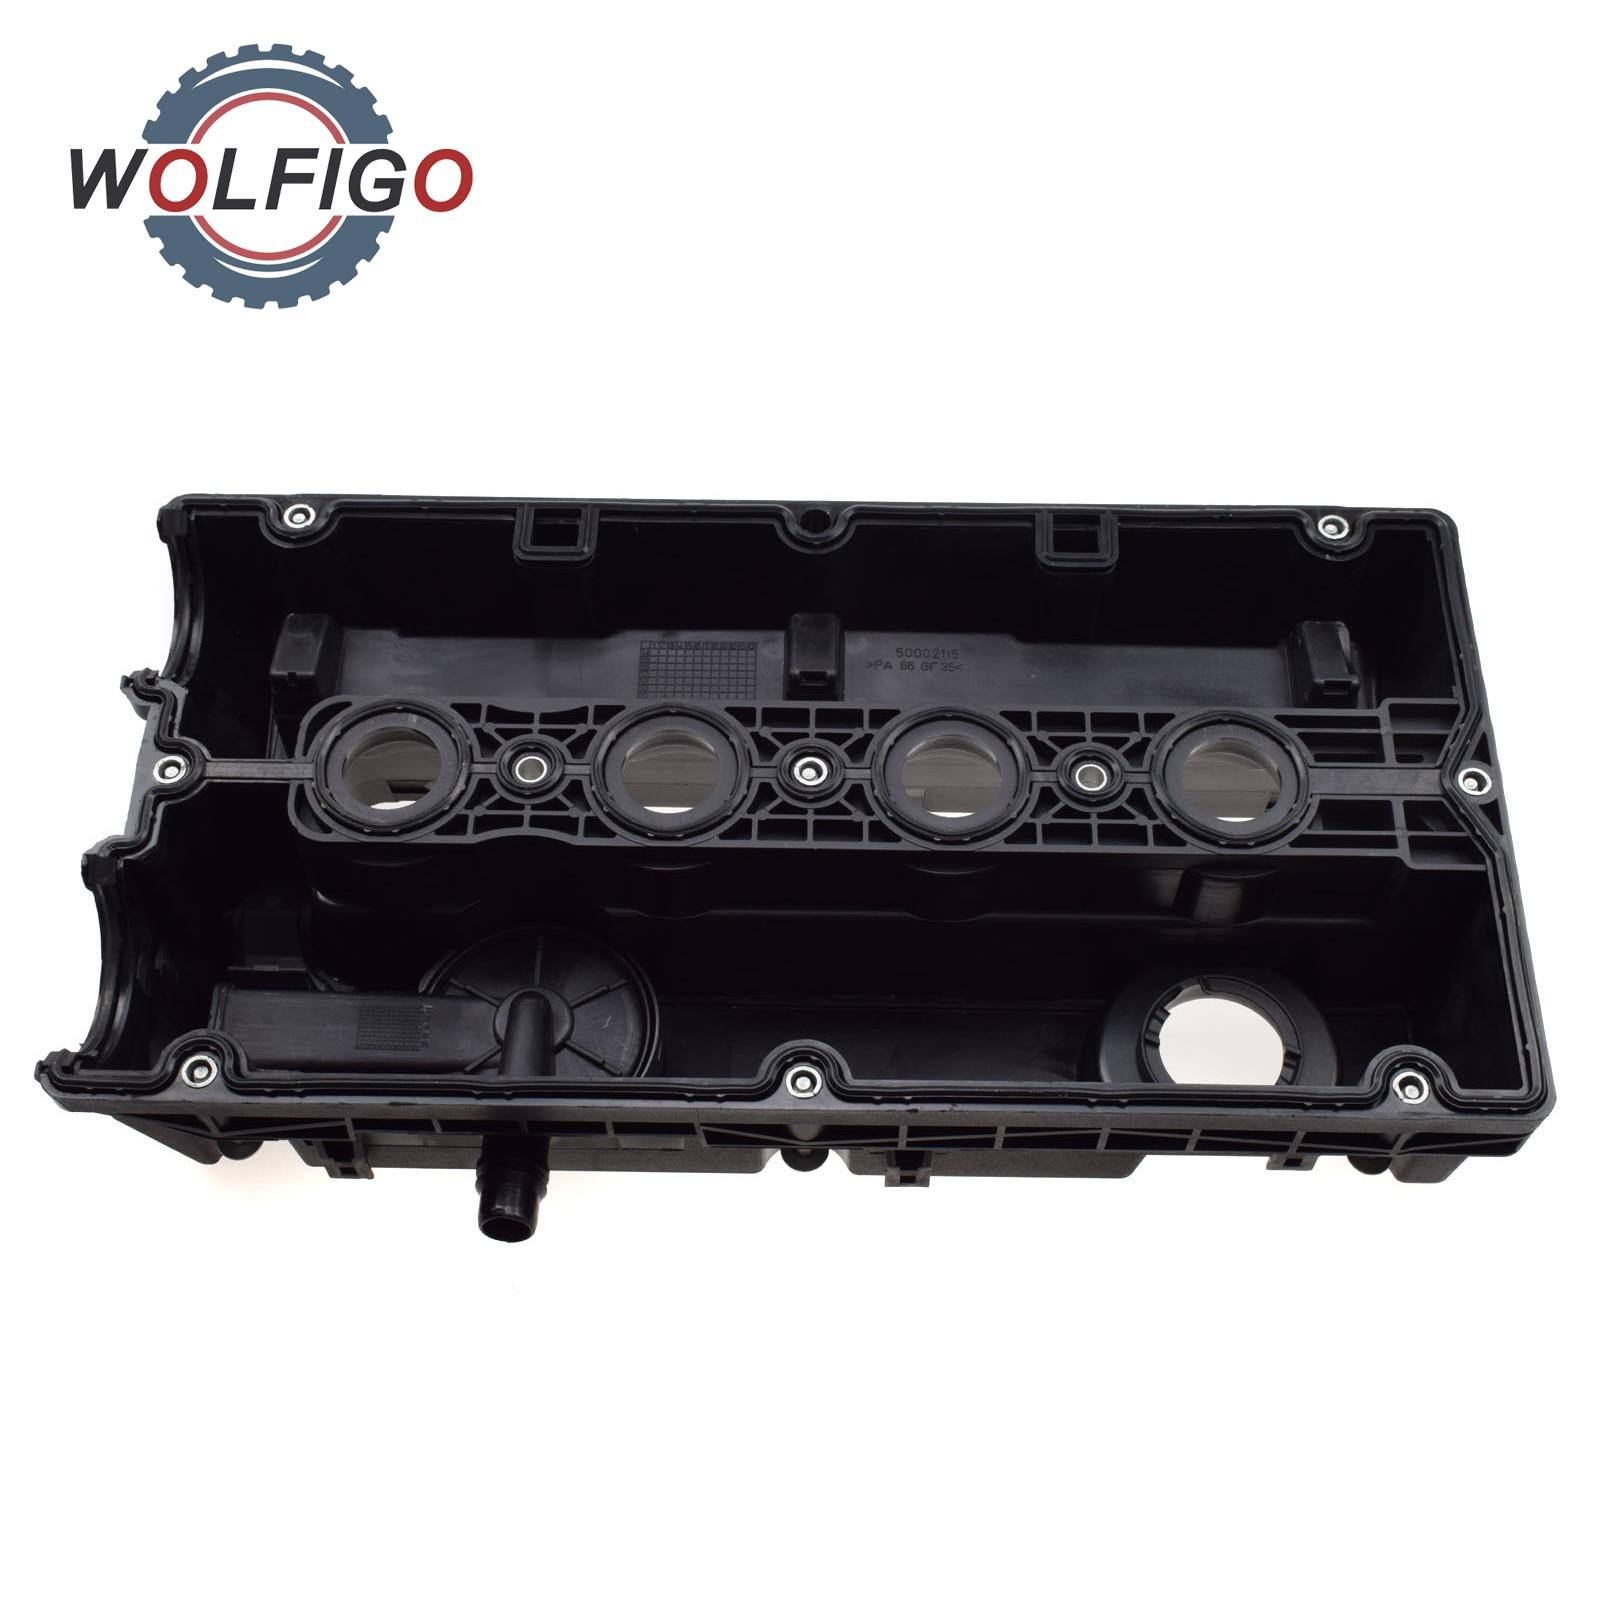 medium resolution of wolfigo cam rocker engine valve cover z16xep 1 6l 55556284 5607159 for vauxhall astra g mk4